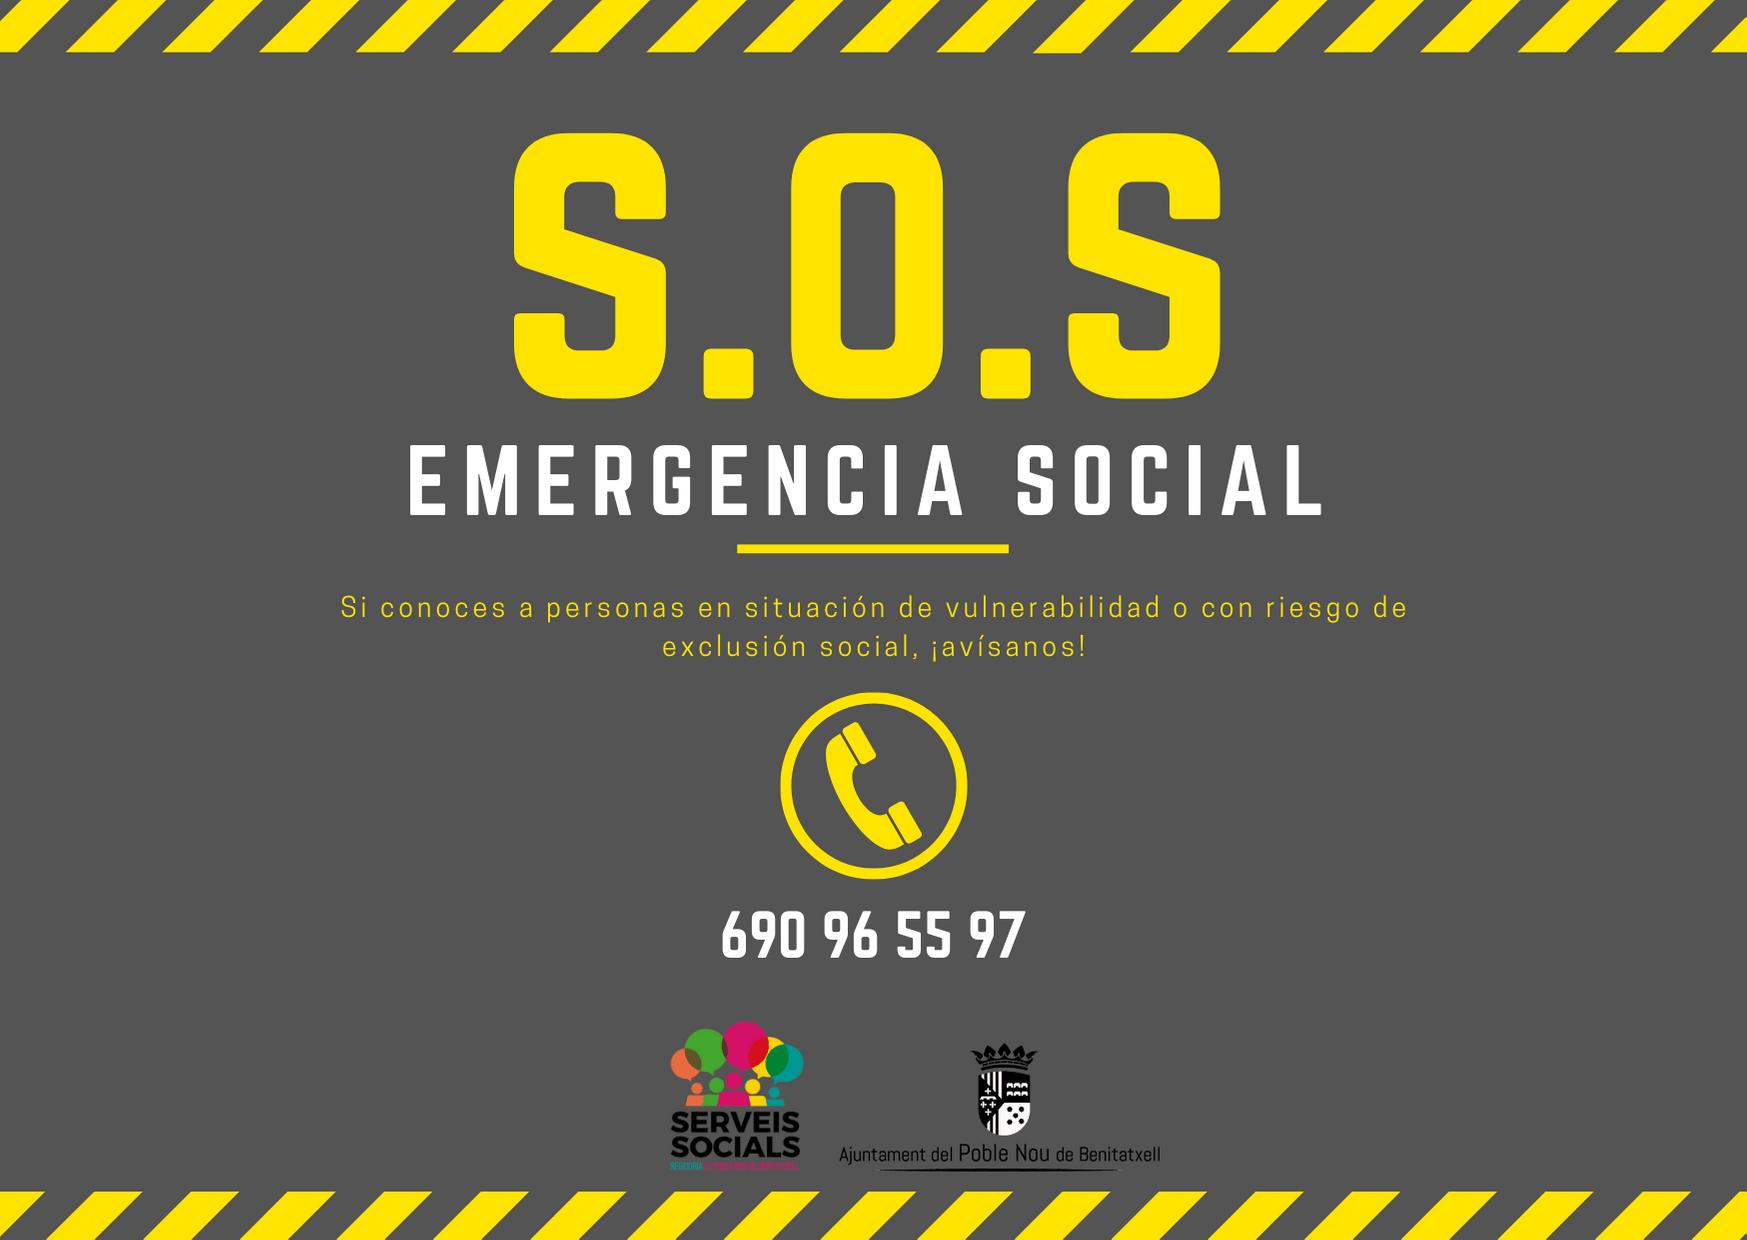 S.O.S Emergencia social Benitatxell